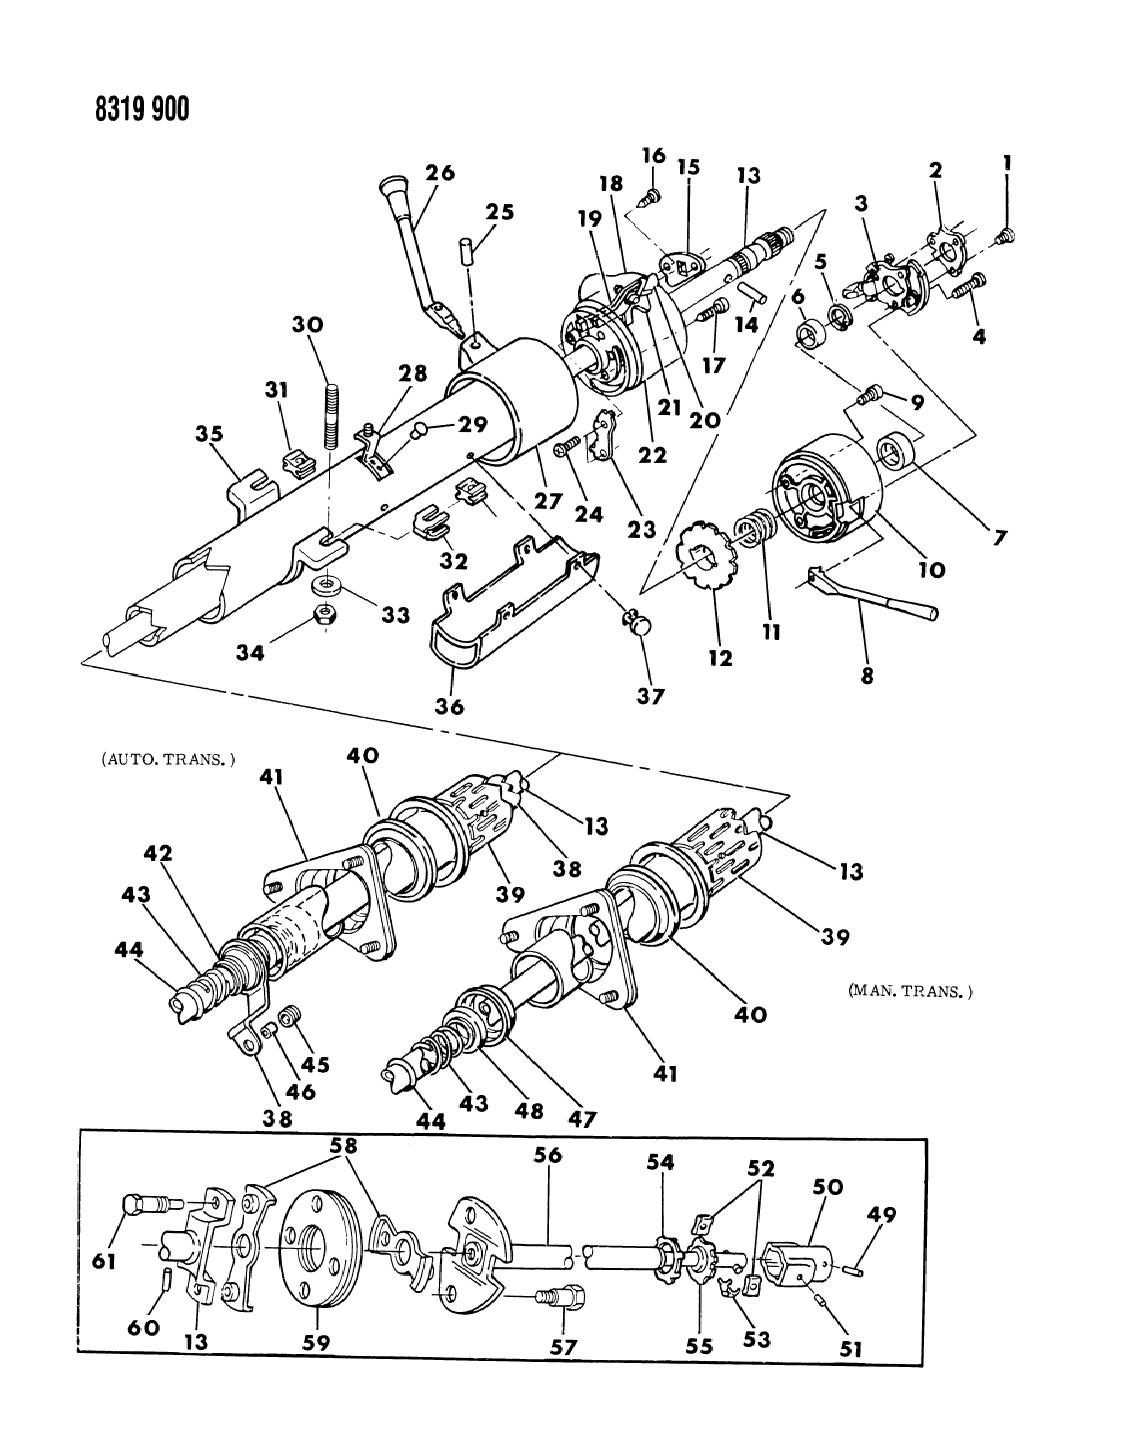 1989 dodge w250 column  steering non